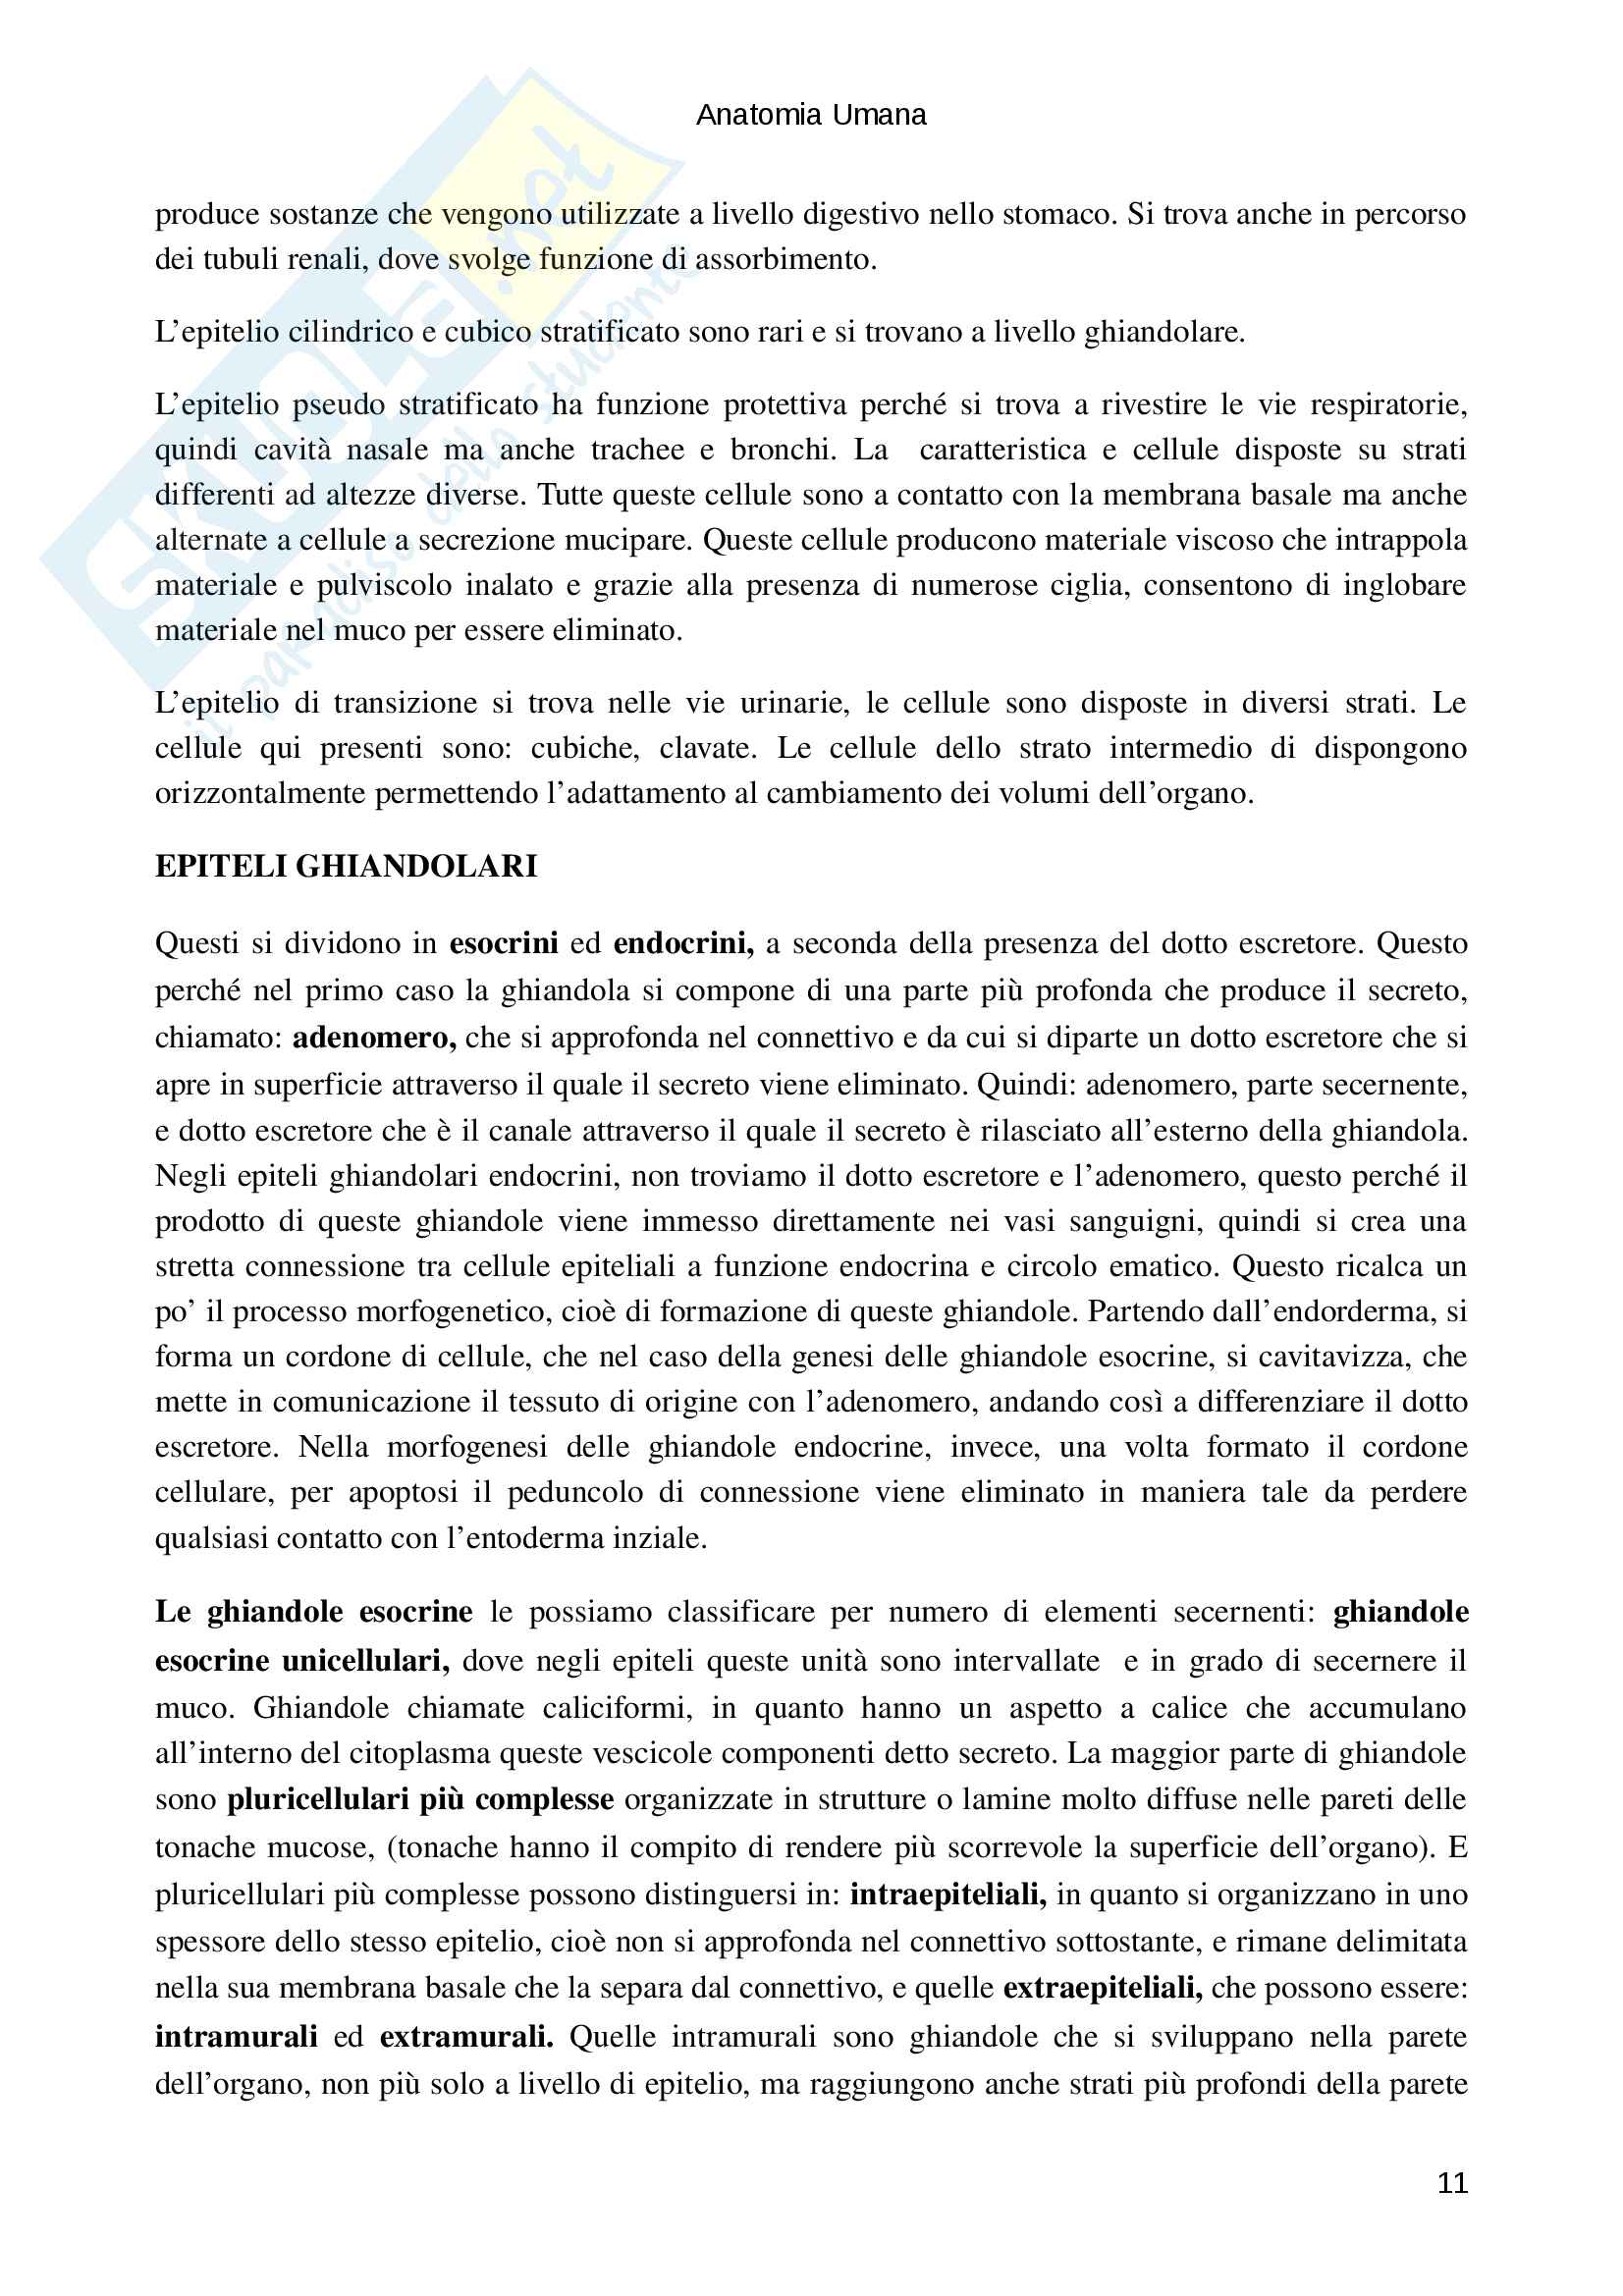 Tessuti epiteliali e connettivi Pag. 11